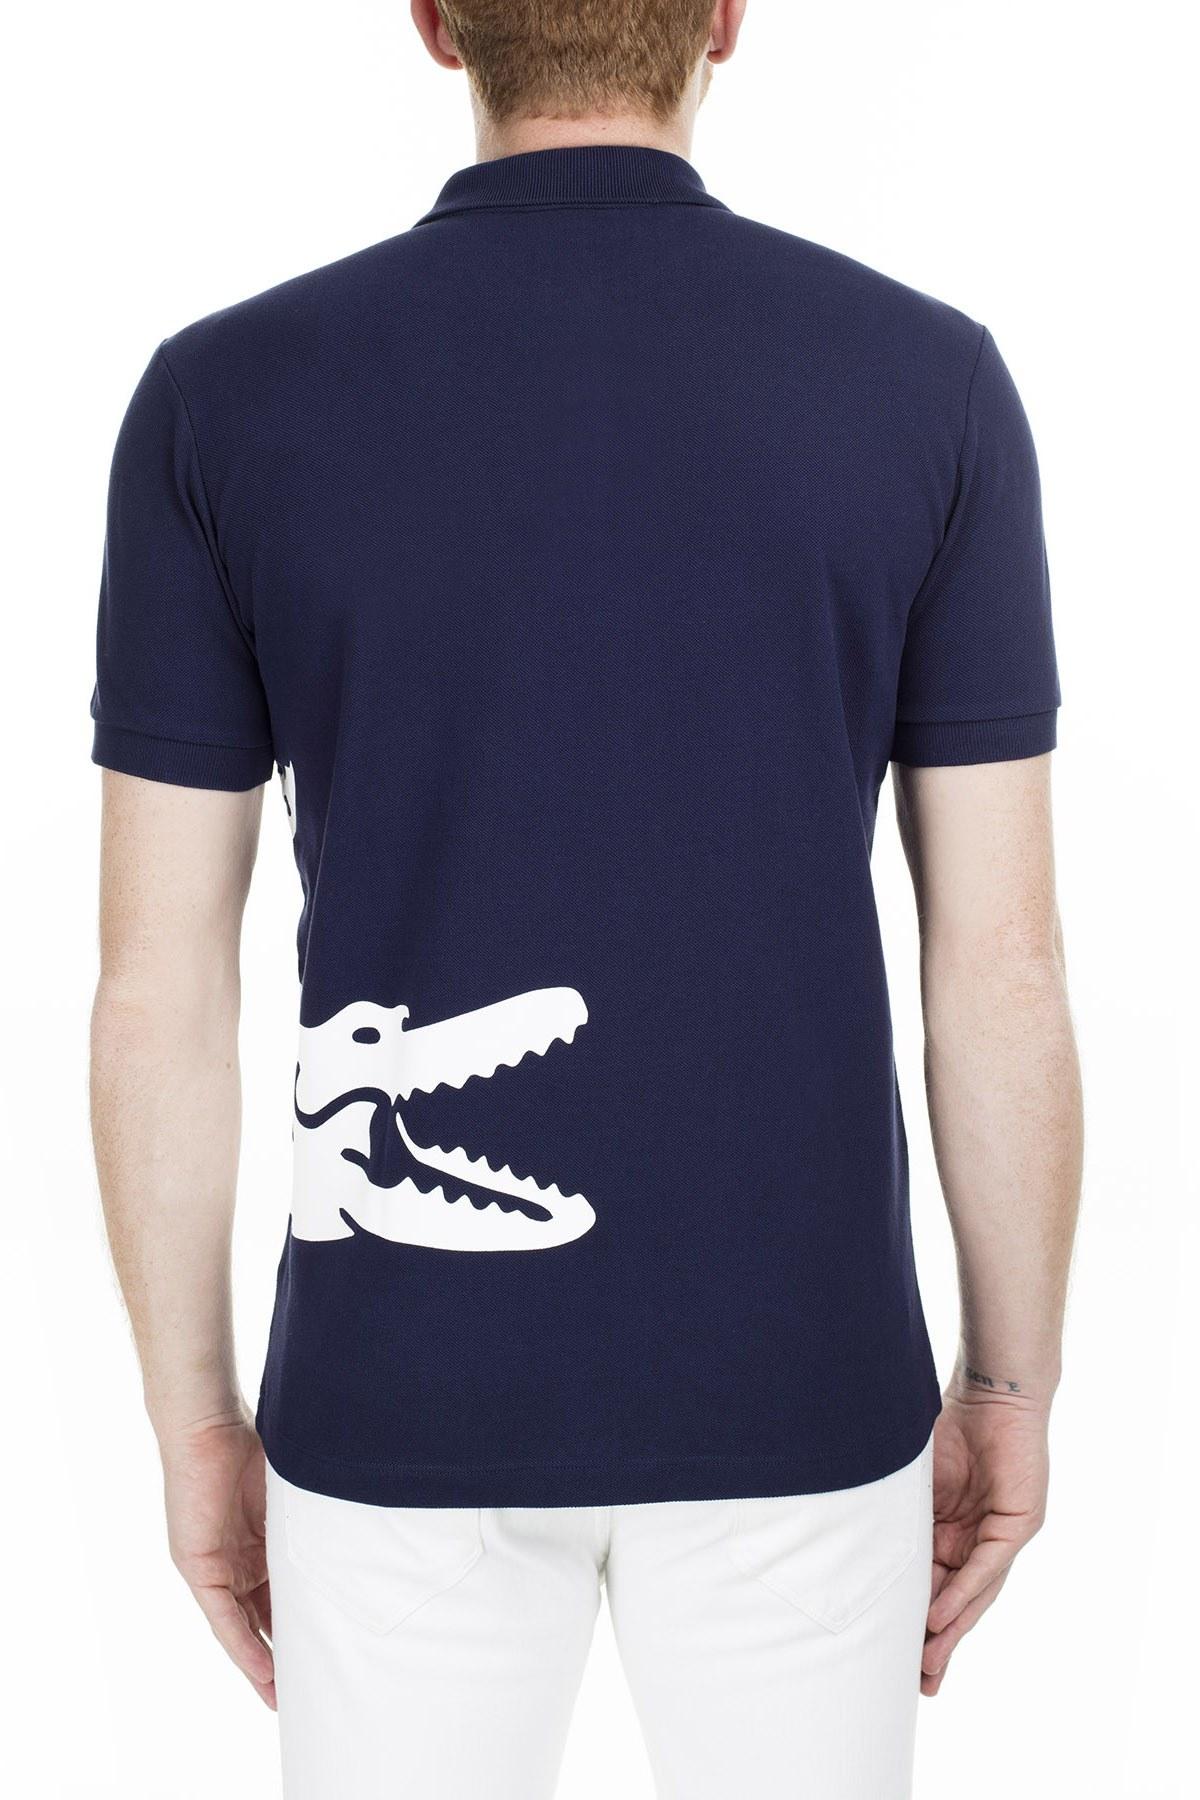 Lacoste Regular Fit T Shirt Erkek Polo PH5284 166 LACİVERT